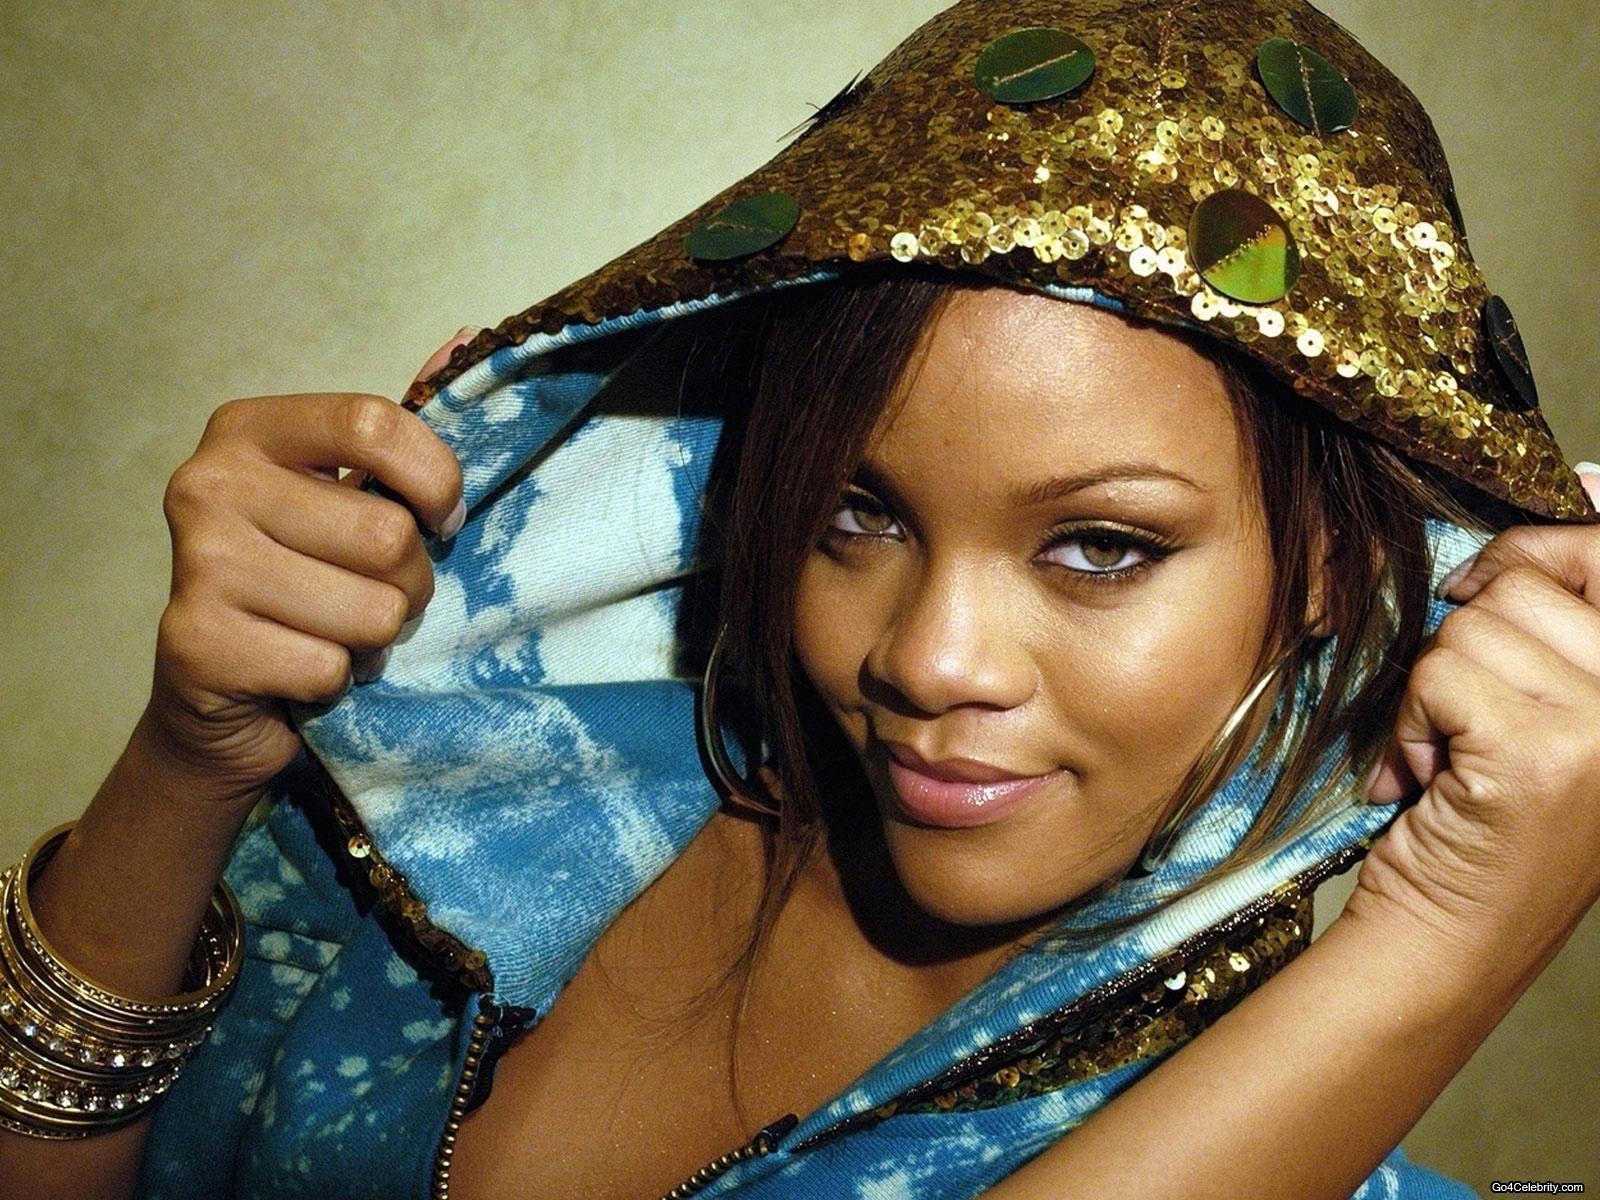 http://images2.fanpop.com/images/photos/6800000/Rihanna-rihanna-6848320-1600-1200.jpg